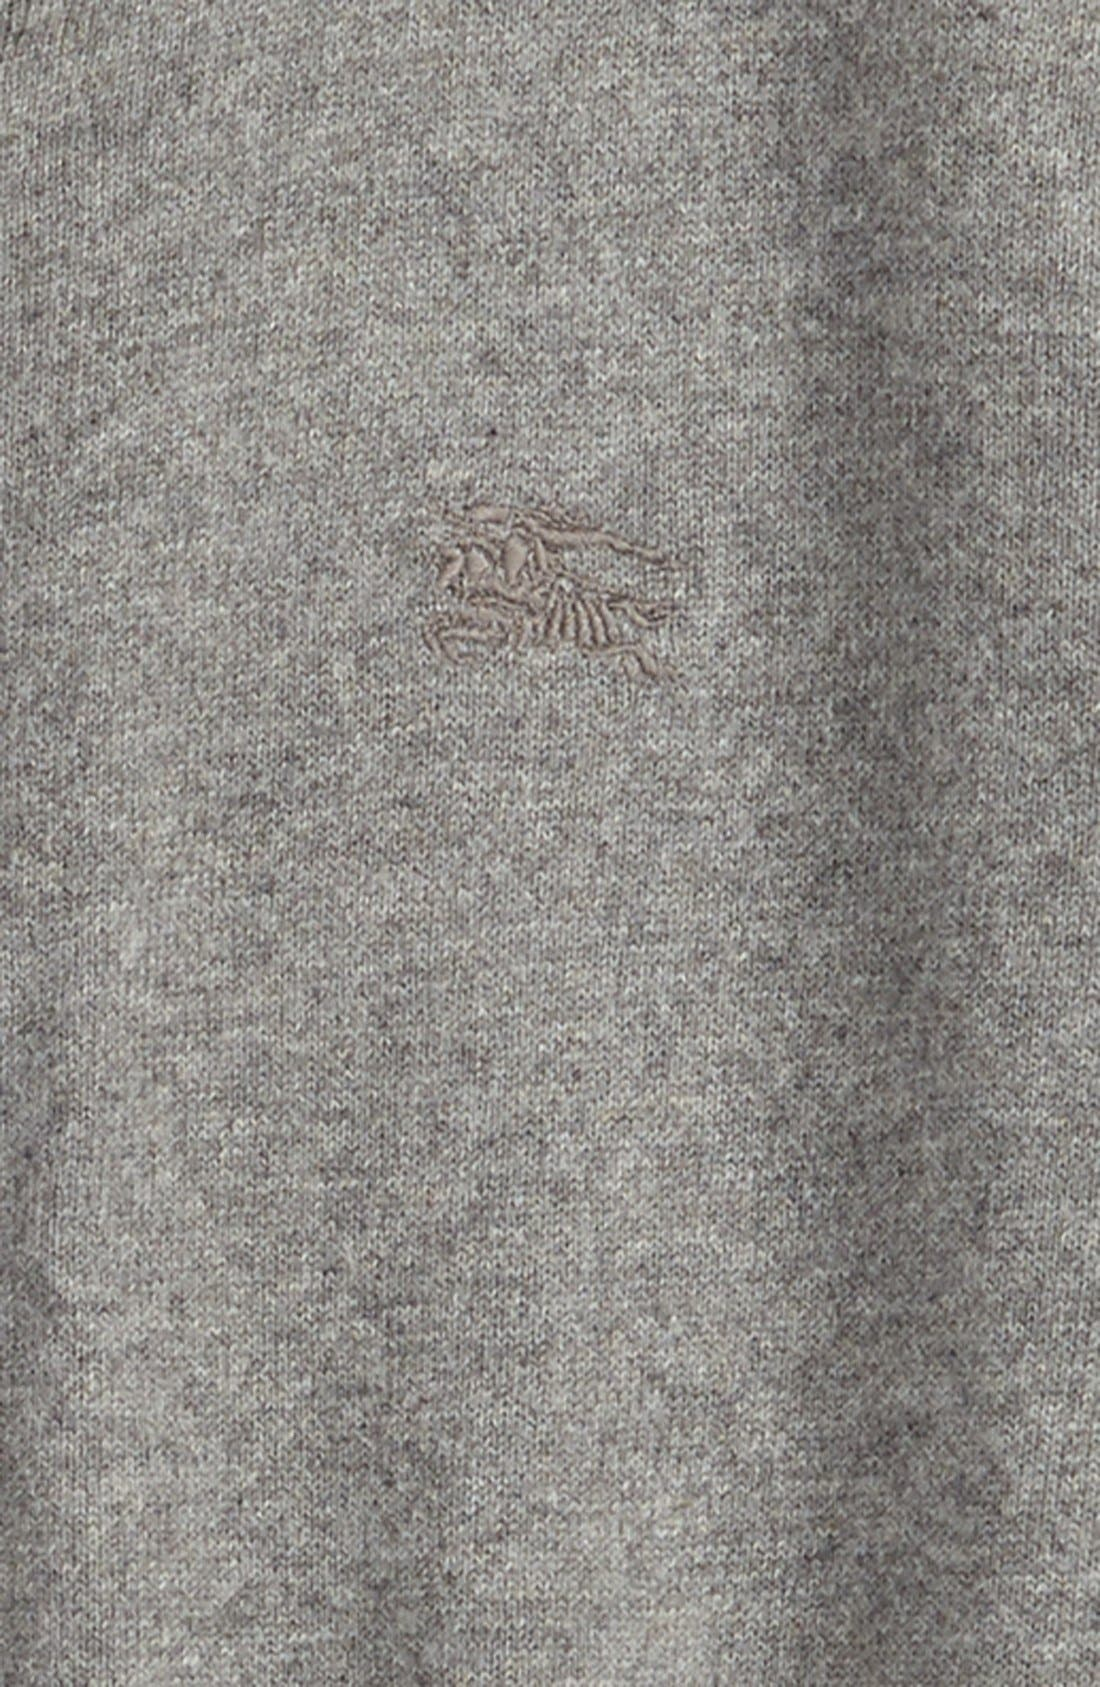 'Jaxon' Zip Front Cotton Cardigan,                             Alternate thumbnail 2, color,                             Mid Grey Melange